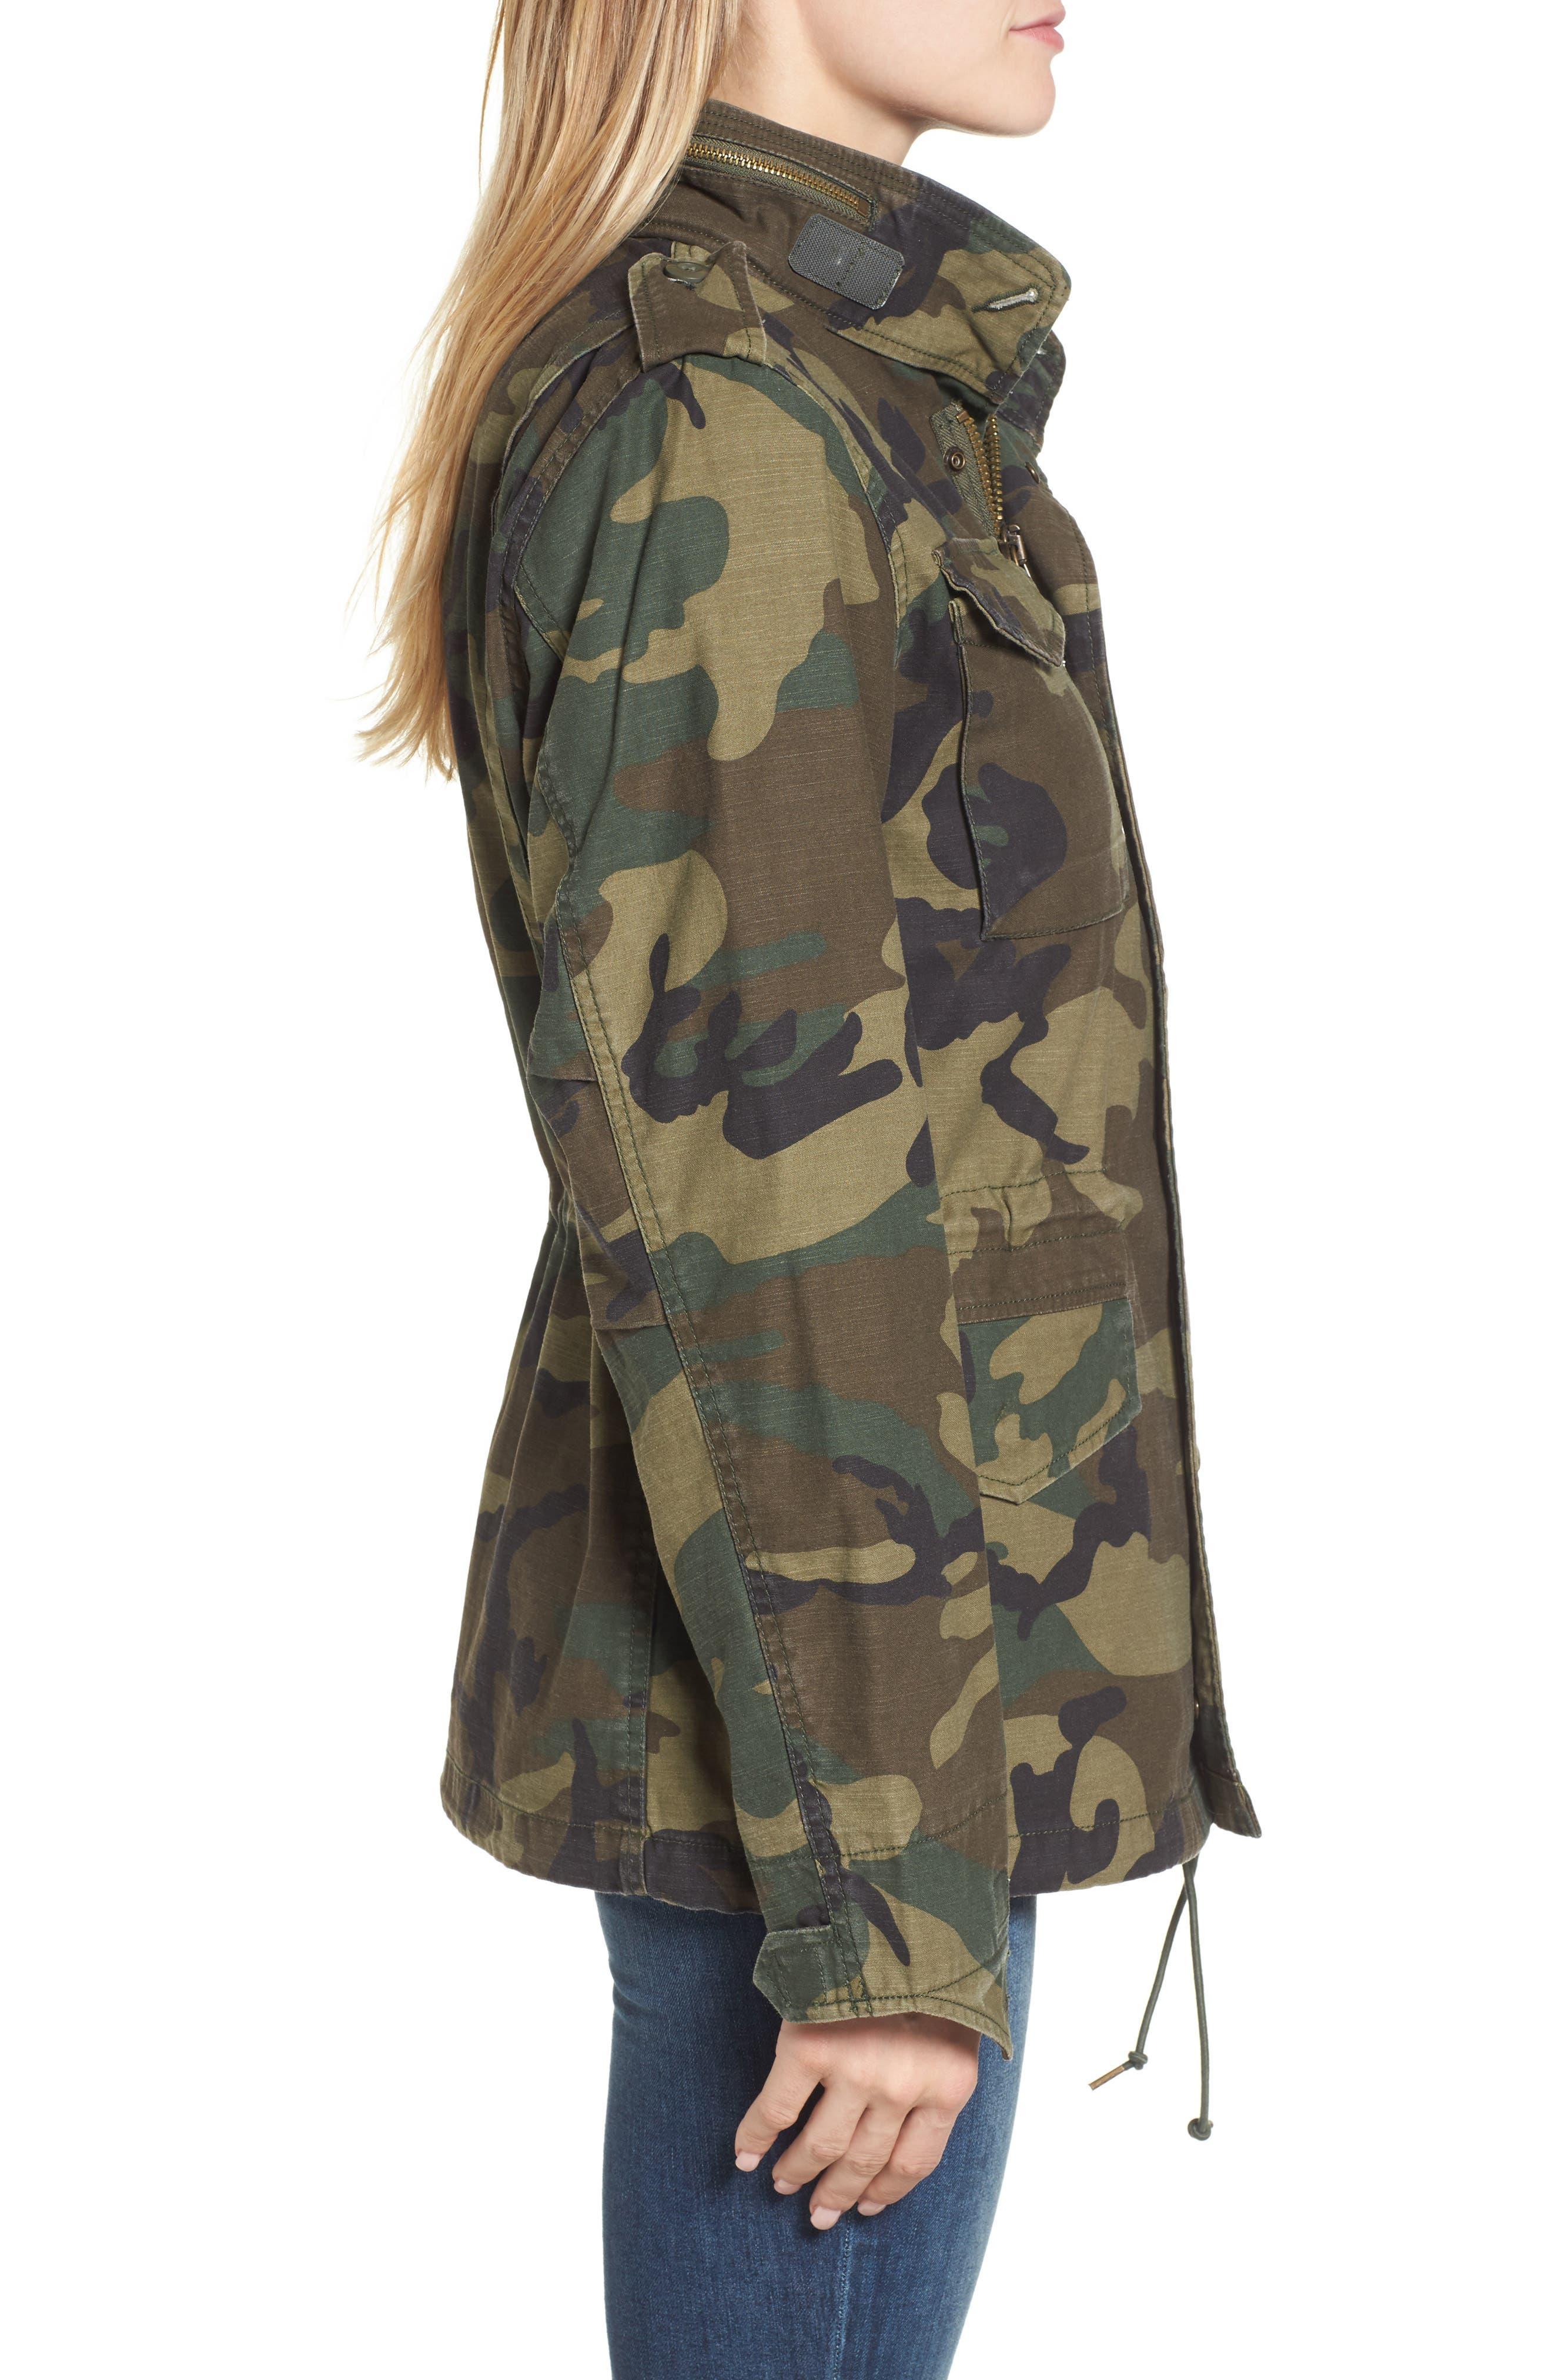 M-65 Defender Camo Field Jacket,                             Alternate thumbnail 3, color,                             Woodland Camo